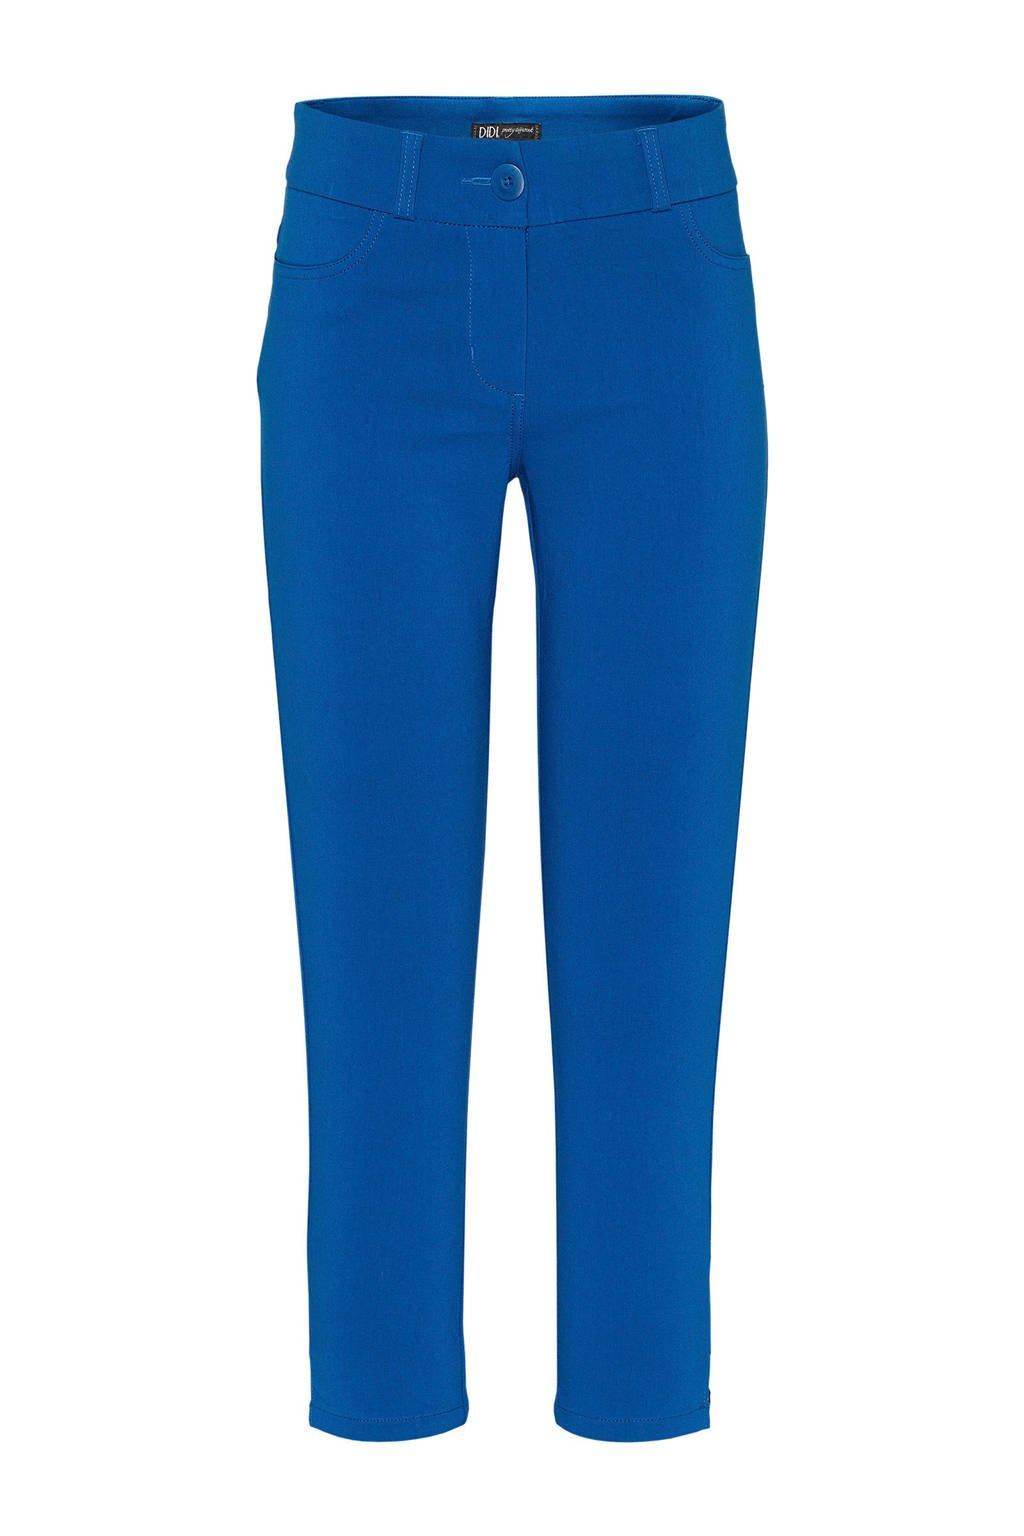 Didi 7/8 skinny jeans blauw, Blauw